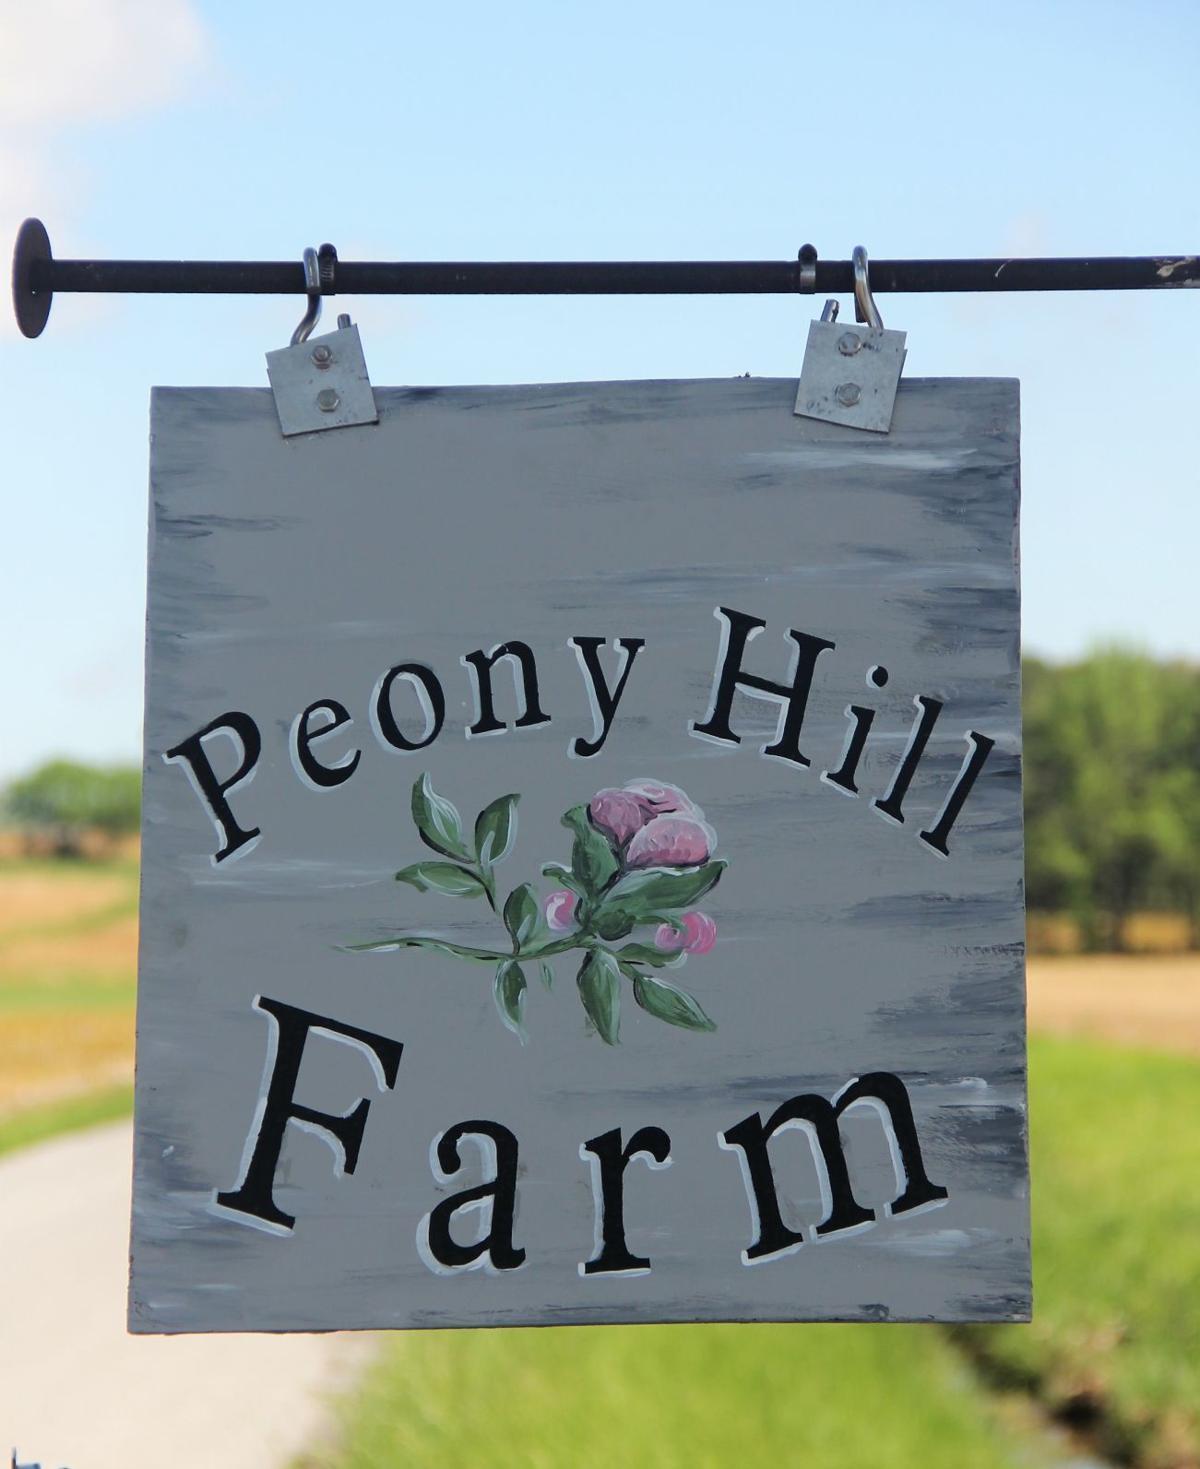 Peony Hill Farm 001.JPG